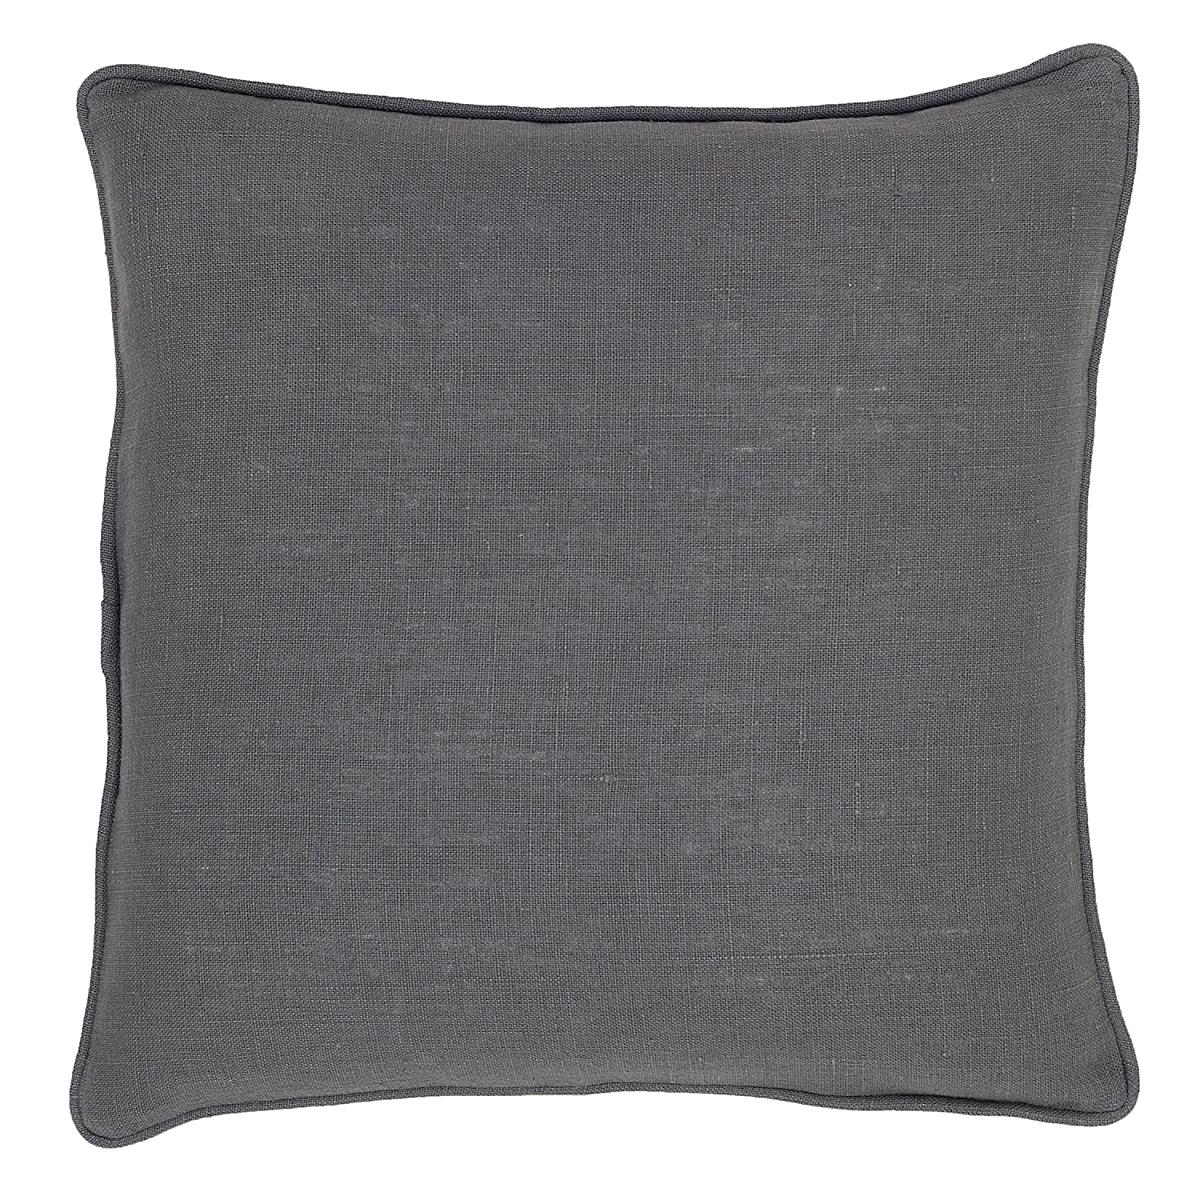 Stone Washed Linen Shale Decorative Pillow